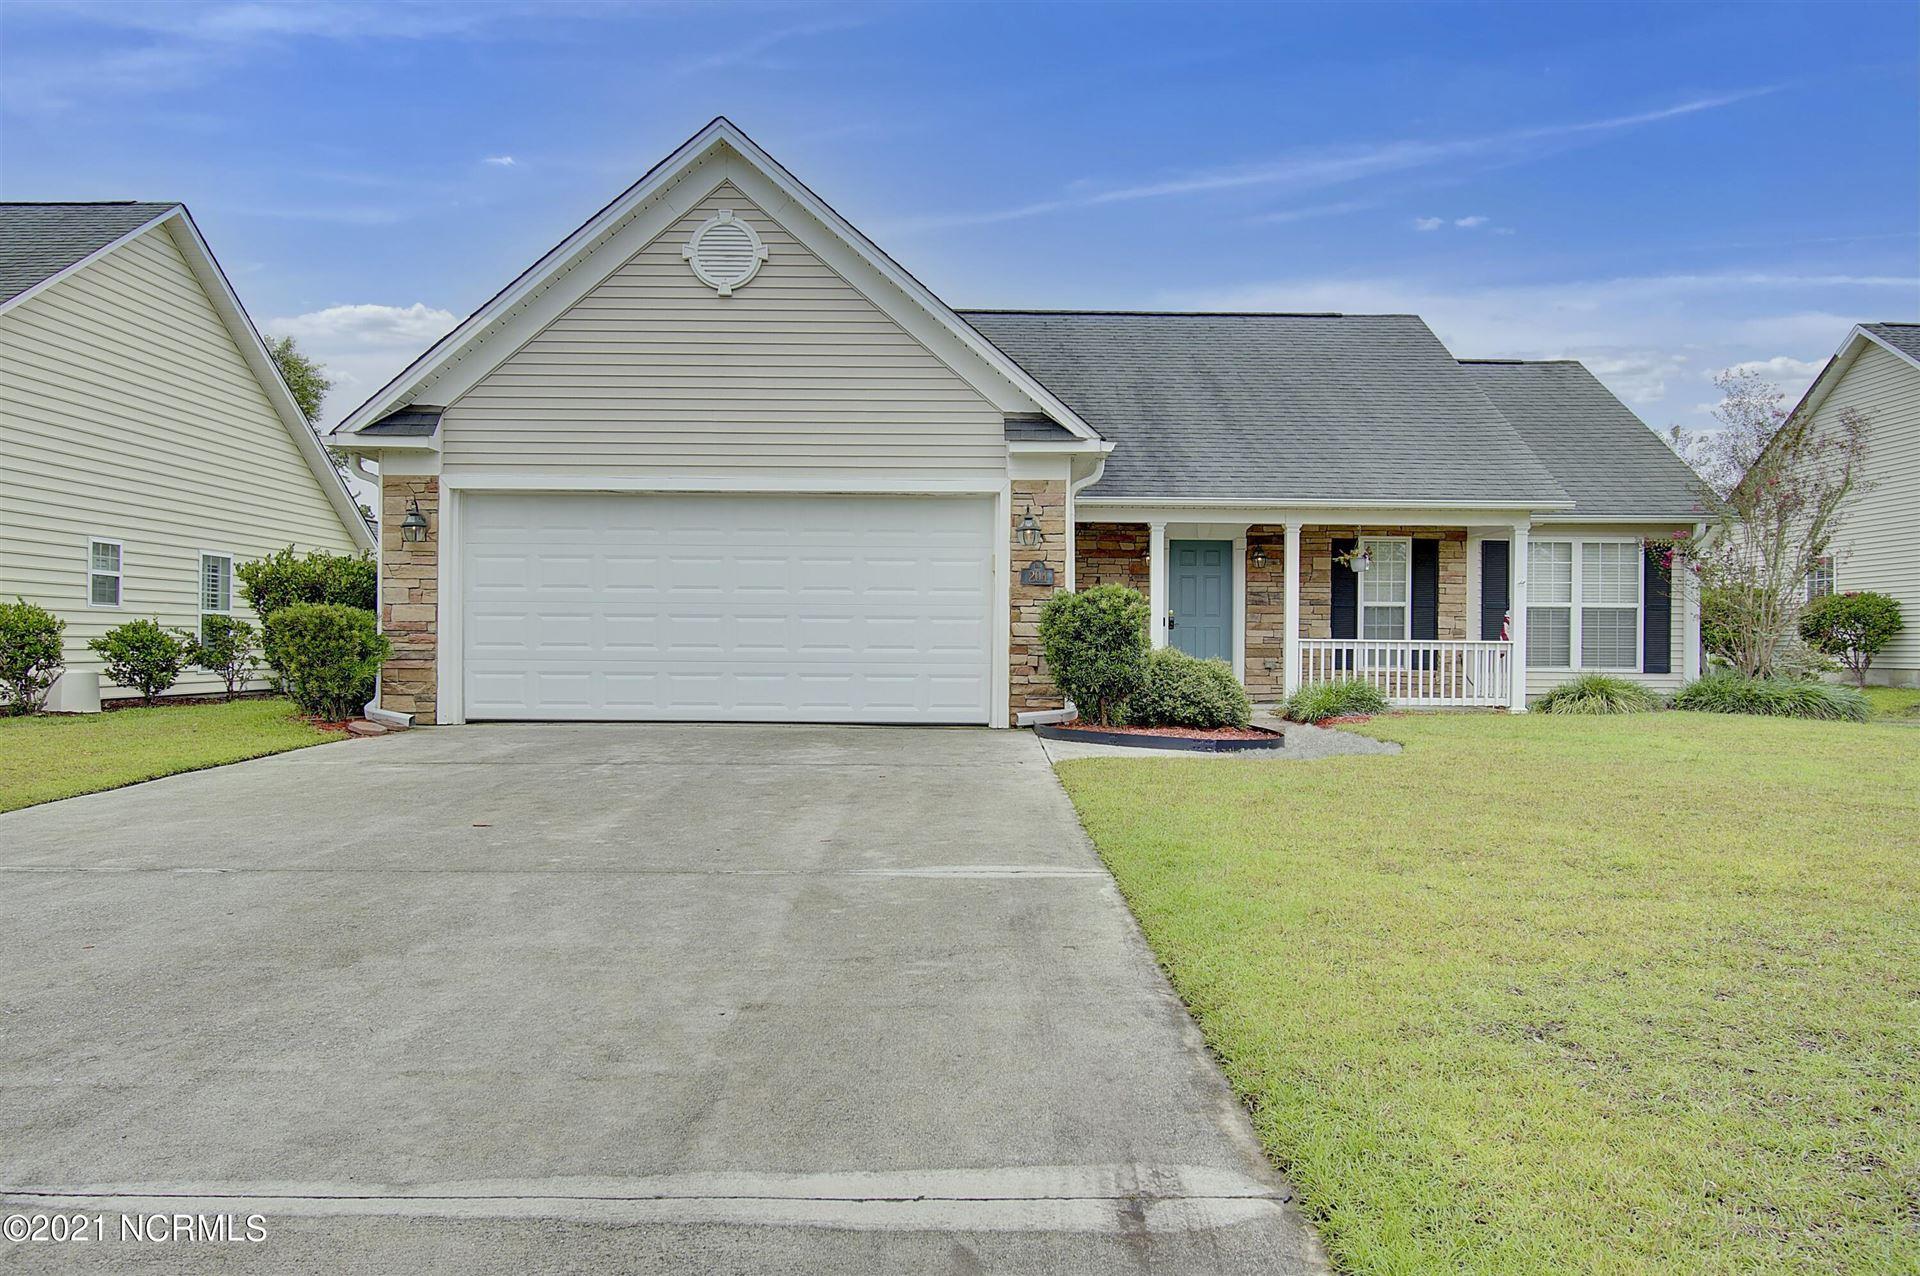 Photo of 204 Heartwood Drive, Hampstead, NC 28443 (MLS # 100287369)